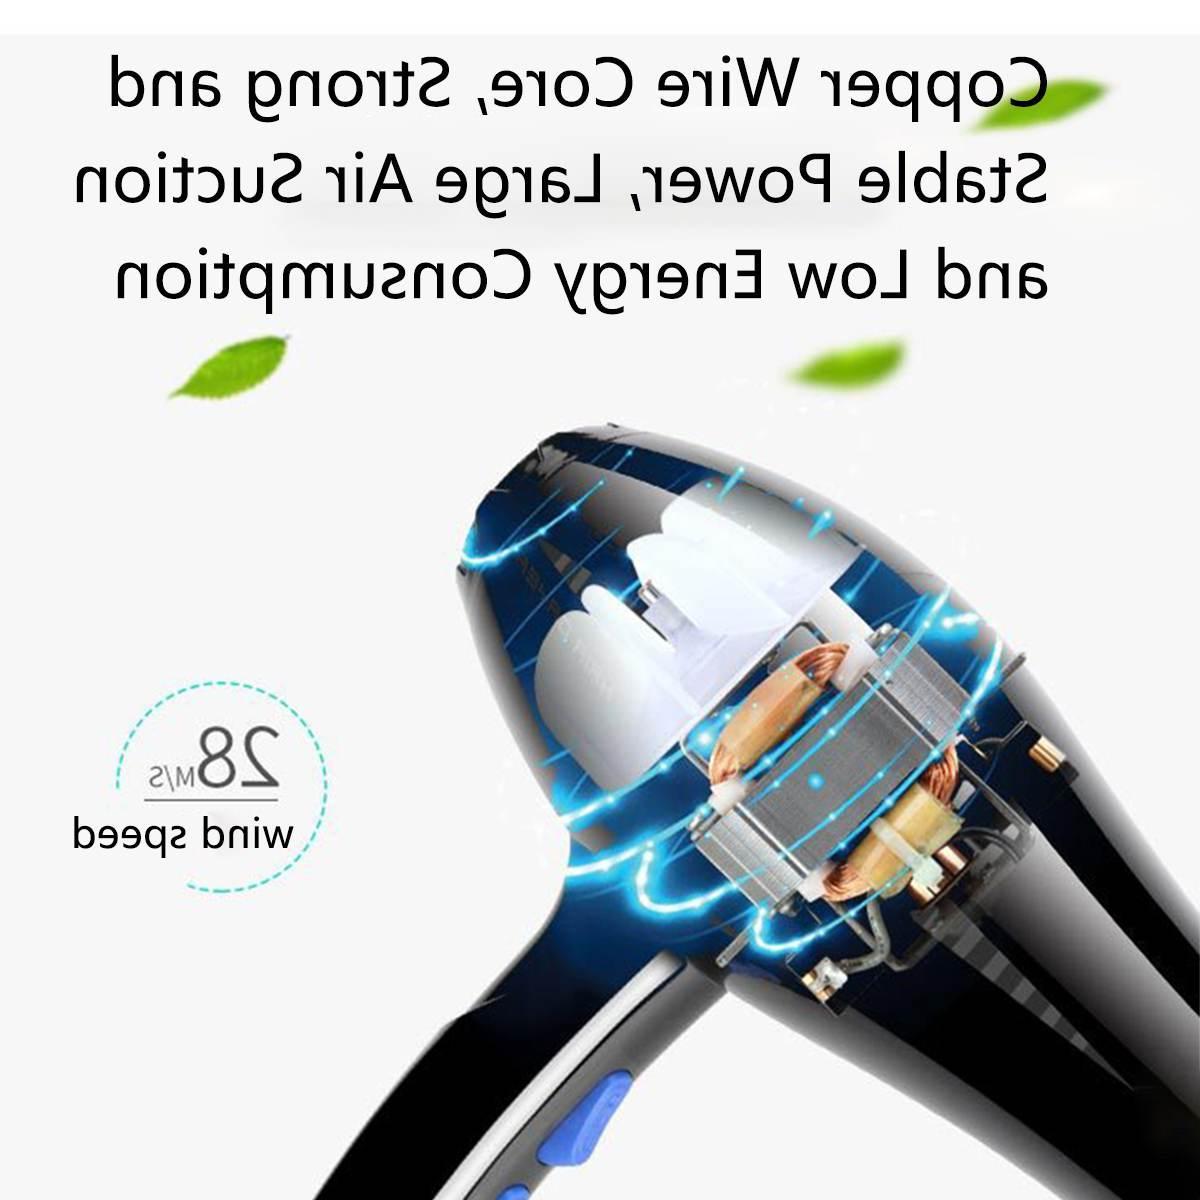 AUGIENB 4000W <font><b>Ionic</b></font> <font><b>Blow</b></font> <font><b>Dryer</b></font> Heating Hairdryer Hairdressing